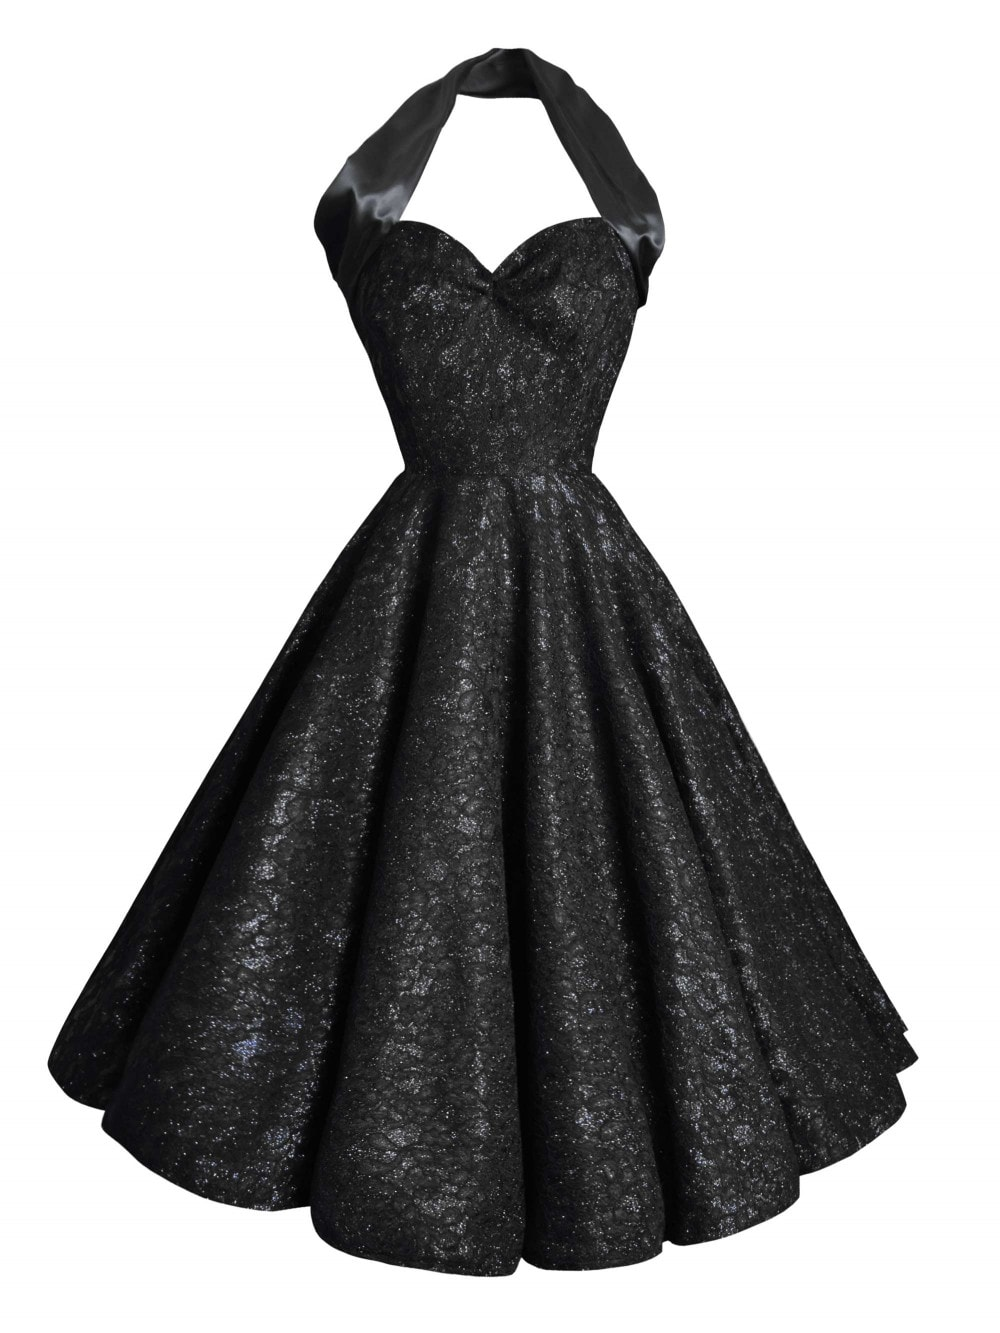 fd9c2602 1950s Halterneck Black Duchess Dress from Vivien of Holloway